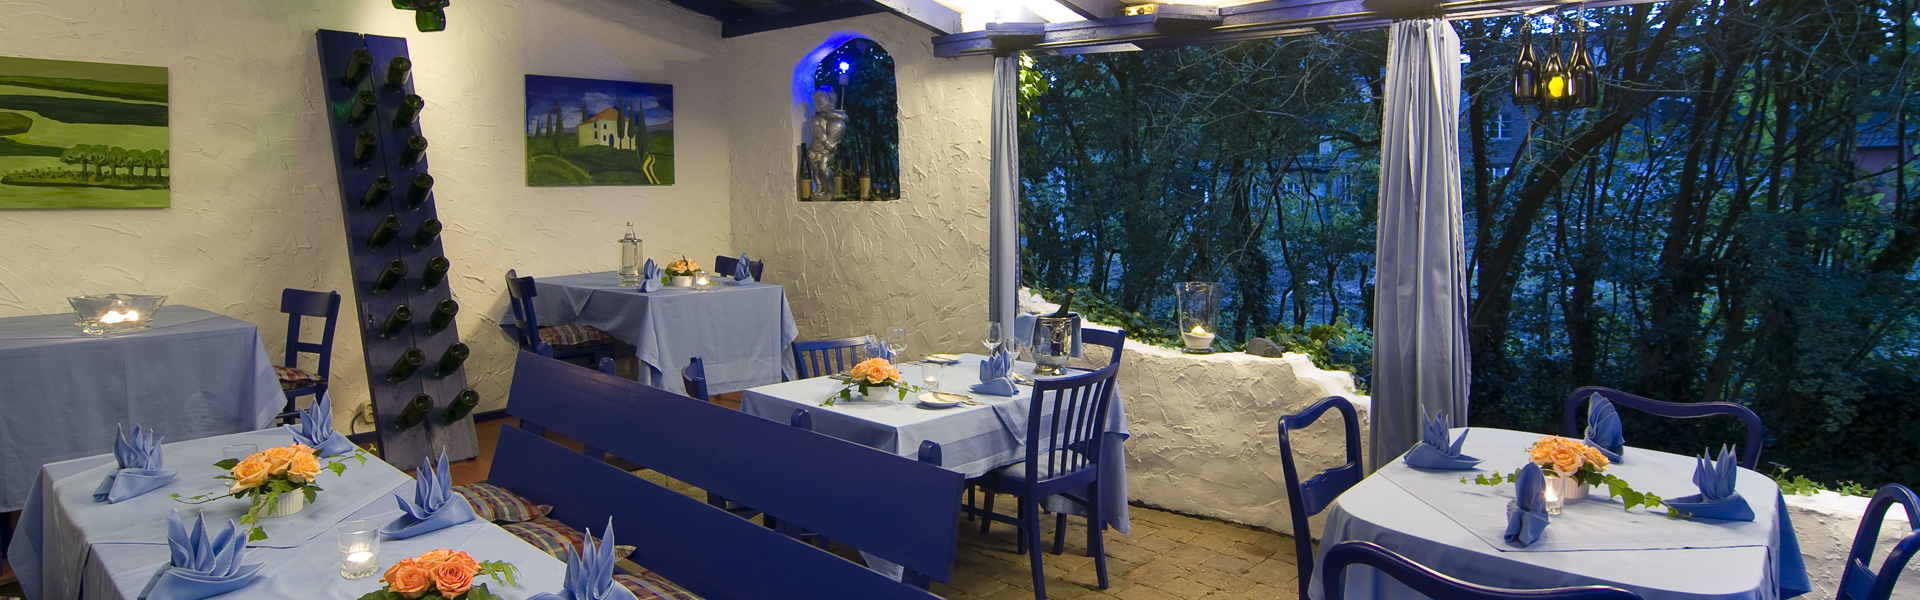 restaurant-1bis25-rhede